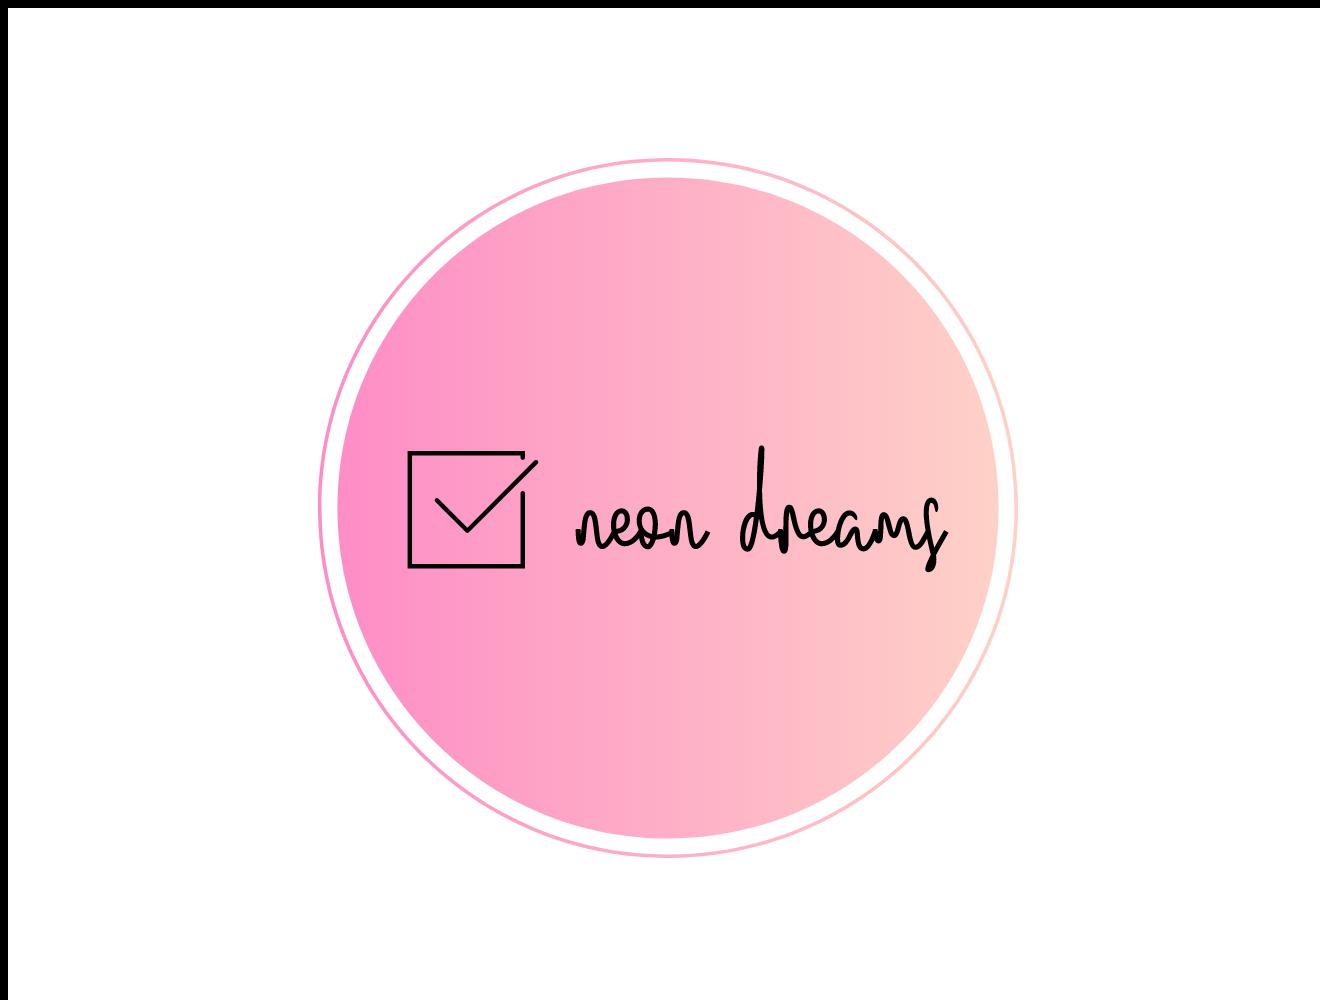 neon dreams diary